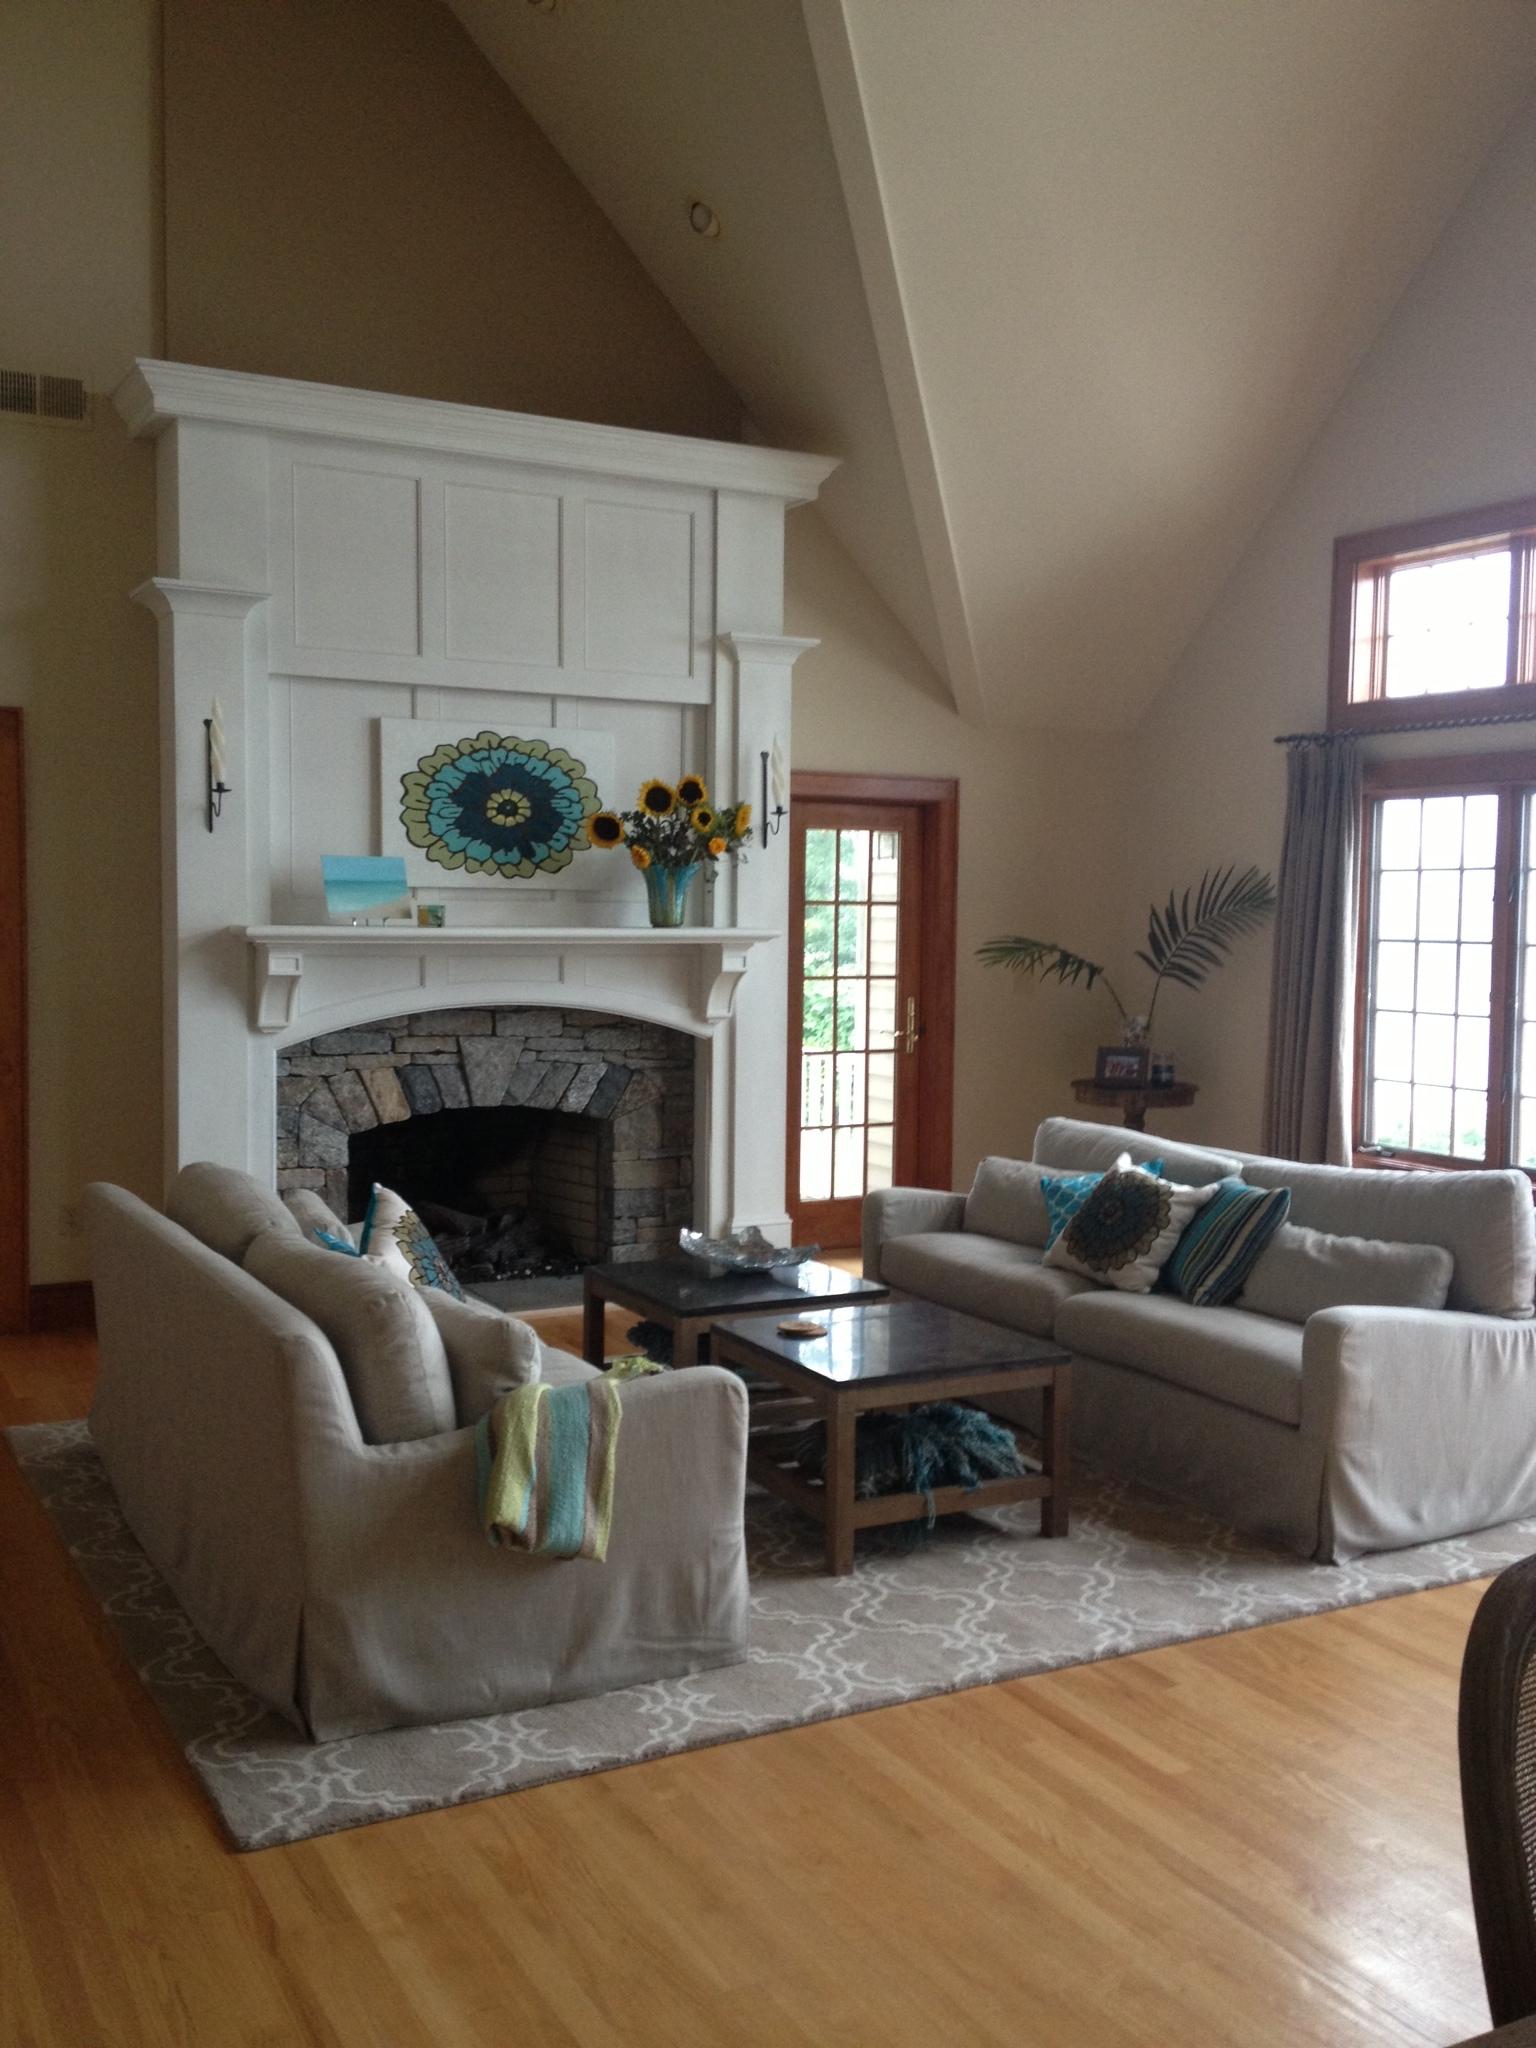 Fireplace Surround with Motorized Panel Lift 1.jpg